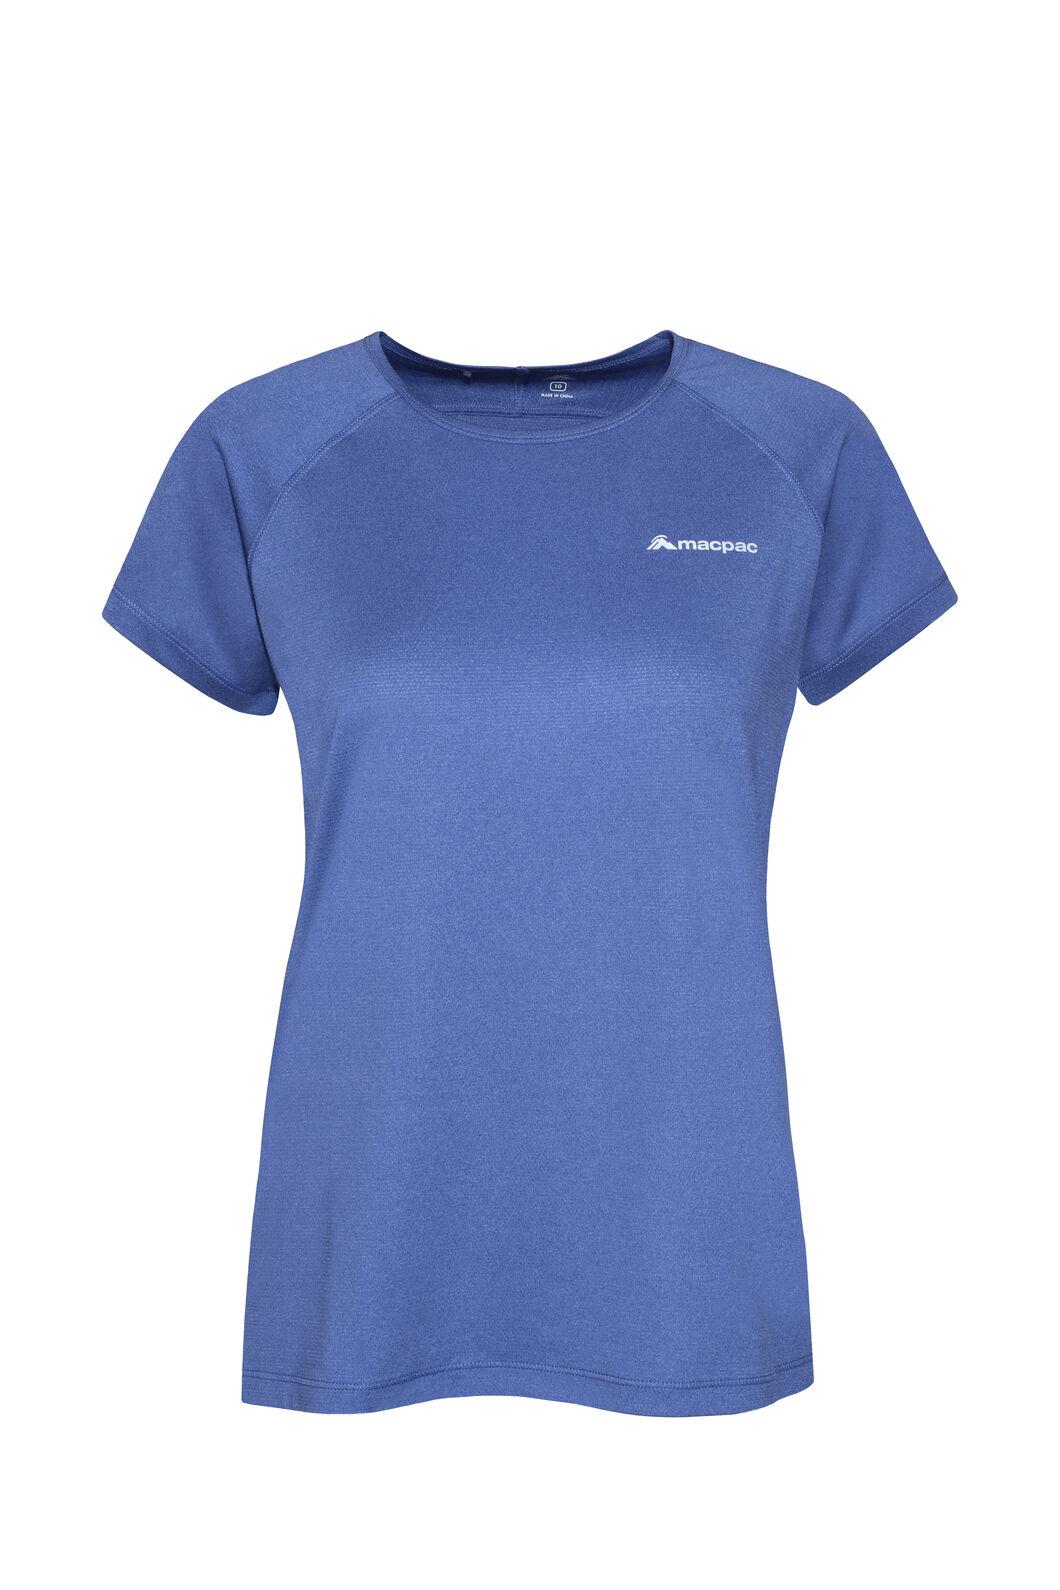 Macpac Eyre Short Sleeve Tee - Women's, Marlin, hi-res